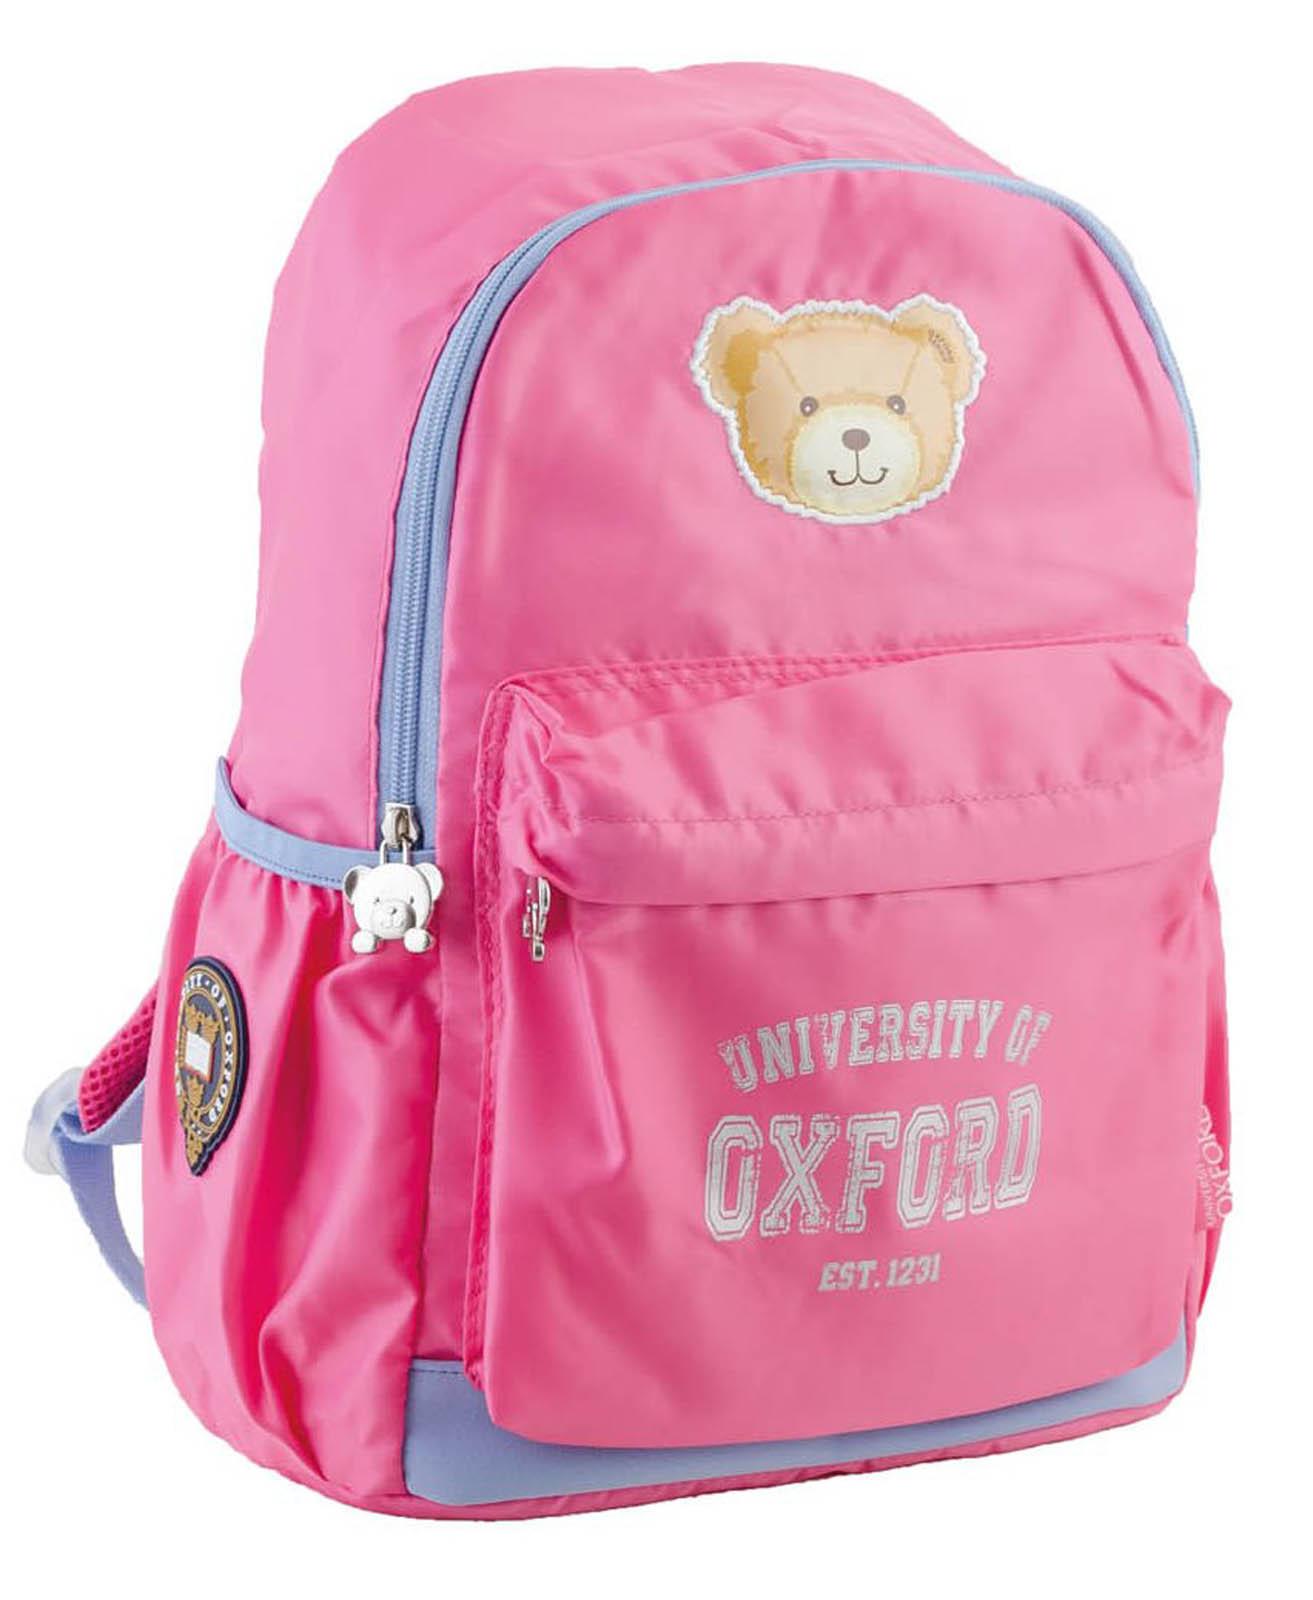 Рюкзак детский  YES  OX-17 j031, 26*37*15.5